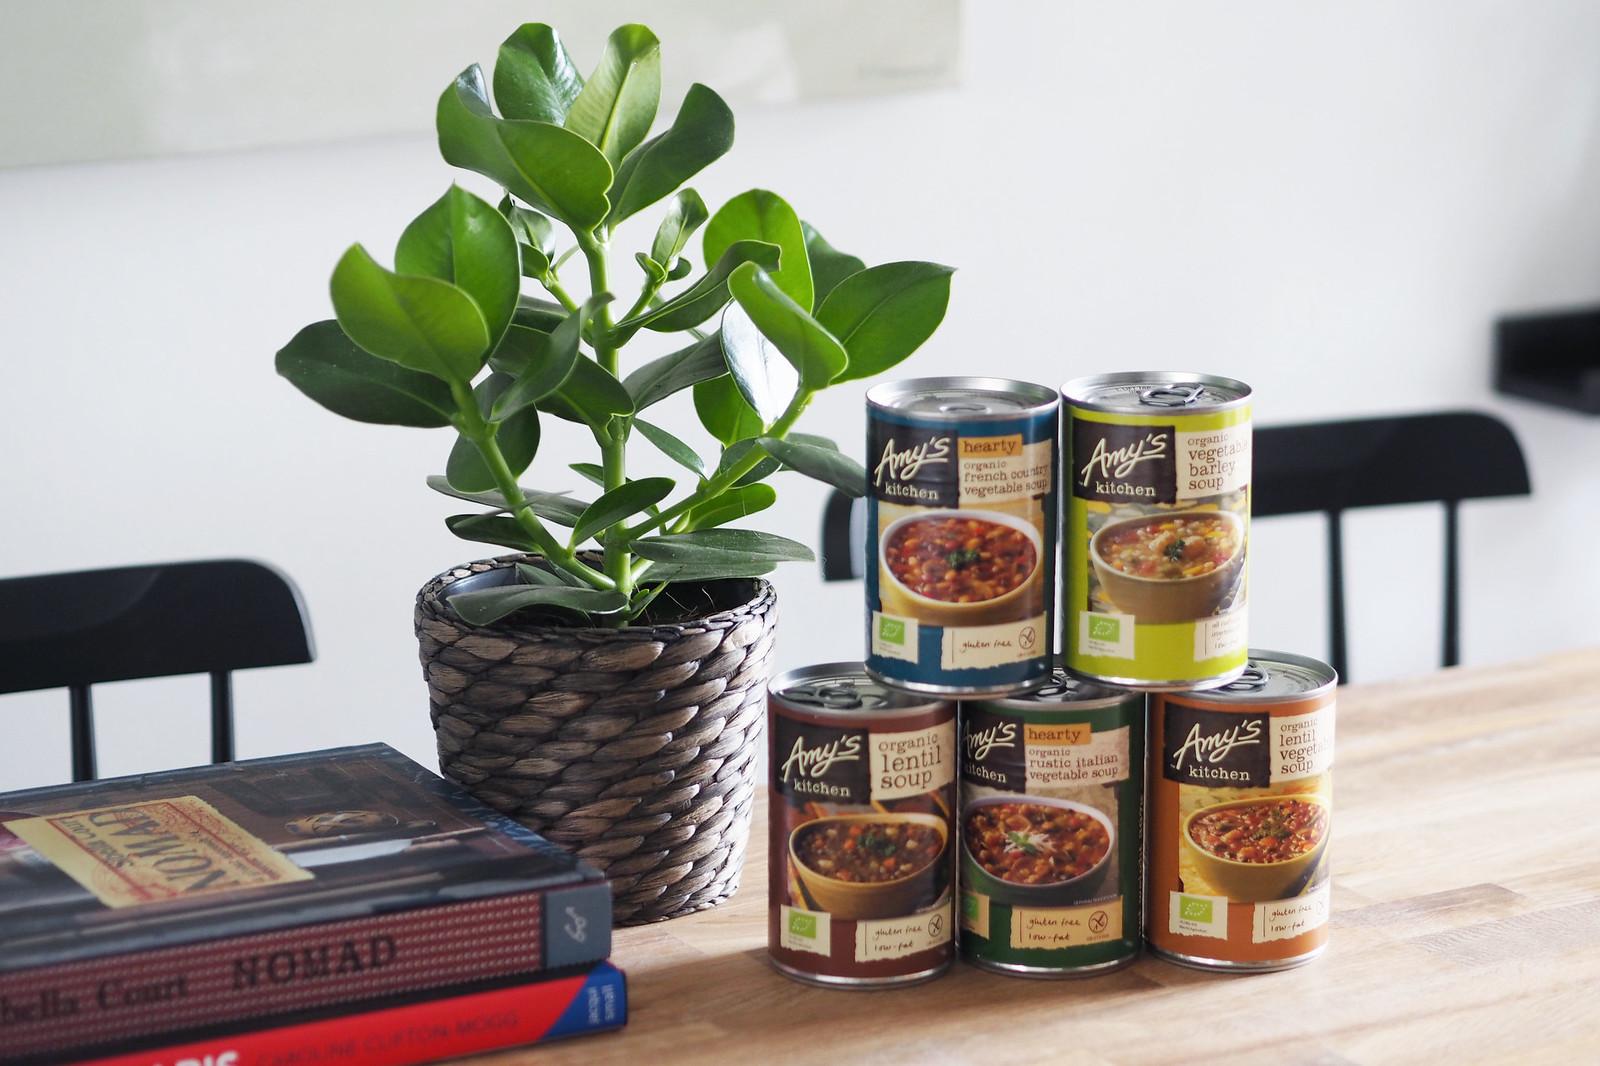 amys kitchen vegan soups